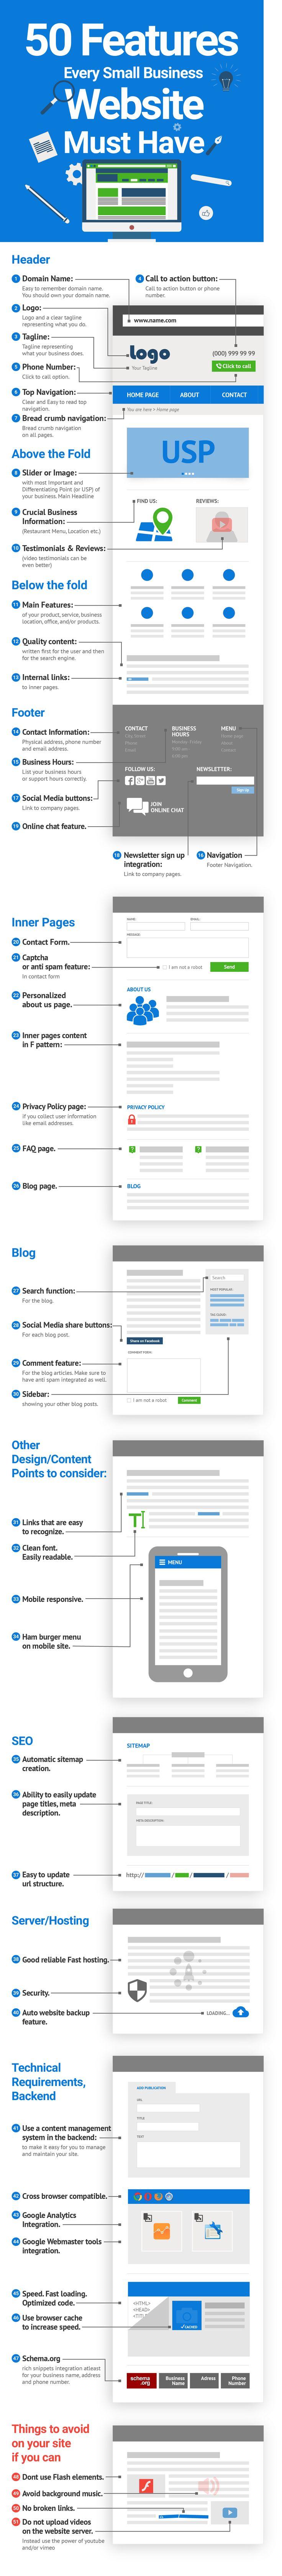 Best Infographic on How to Develop a Website! Check out #ontheblog   http://theprofitgoddess.com/how-to-develop-a-website-must-have-features #smallbiz #eventprofs #entrepreneur #B2B